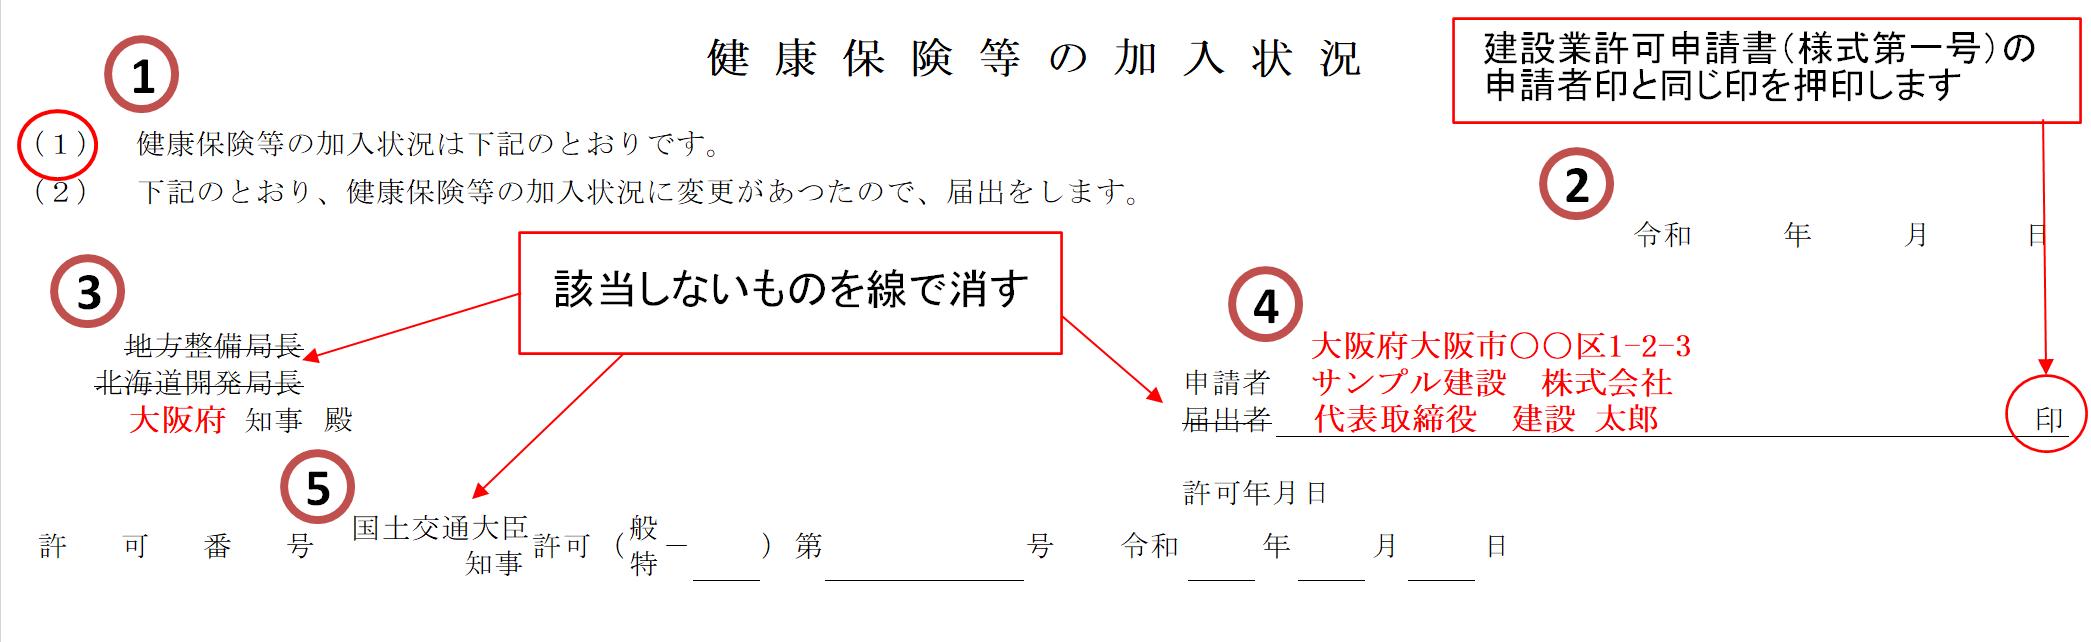 style-20-3-sample-1